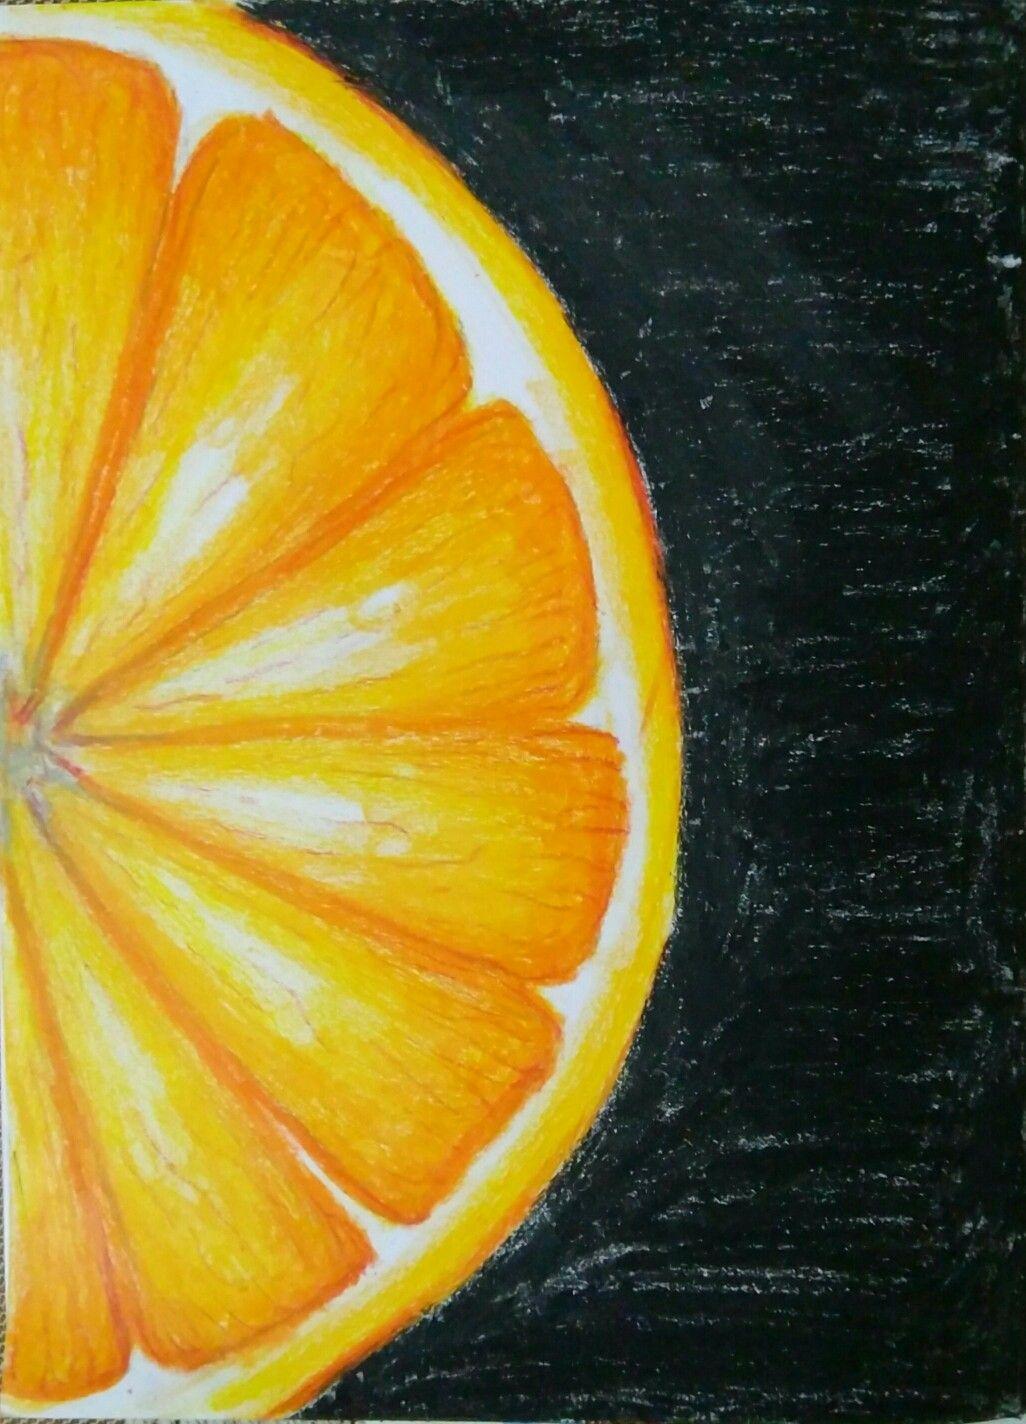 Oil Pastel Art Orange Dessin Pastel Dessin De Fleur Dessins